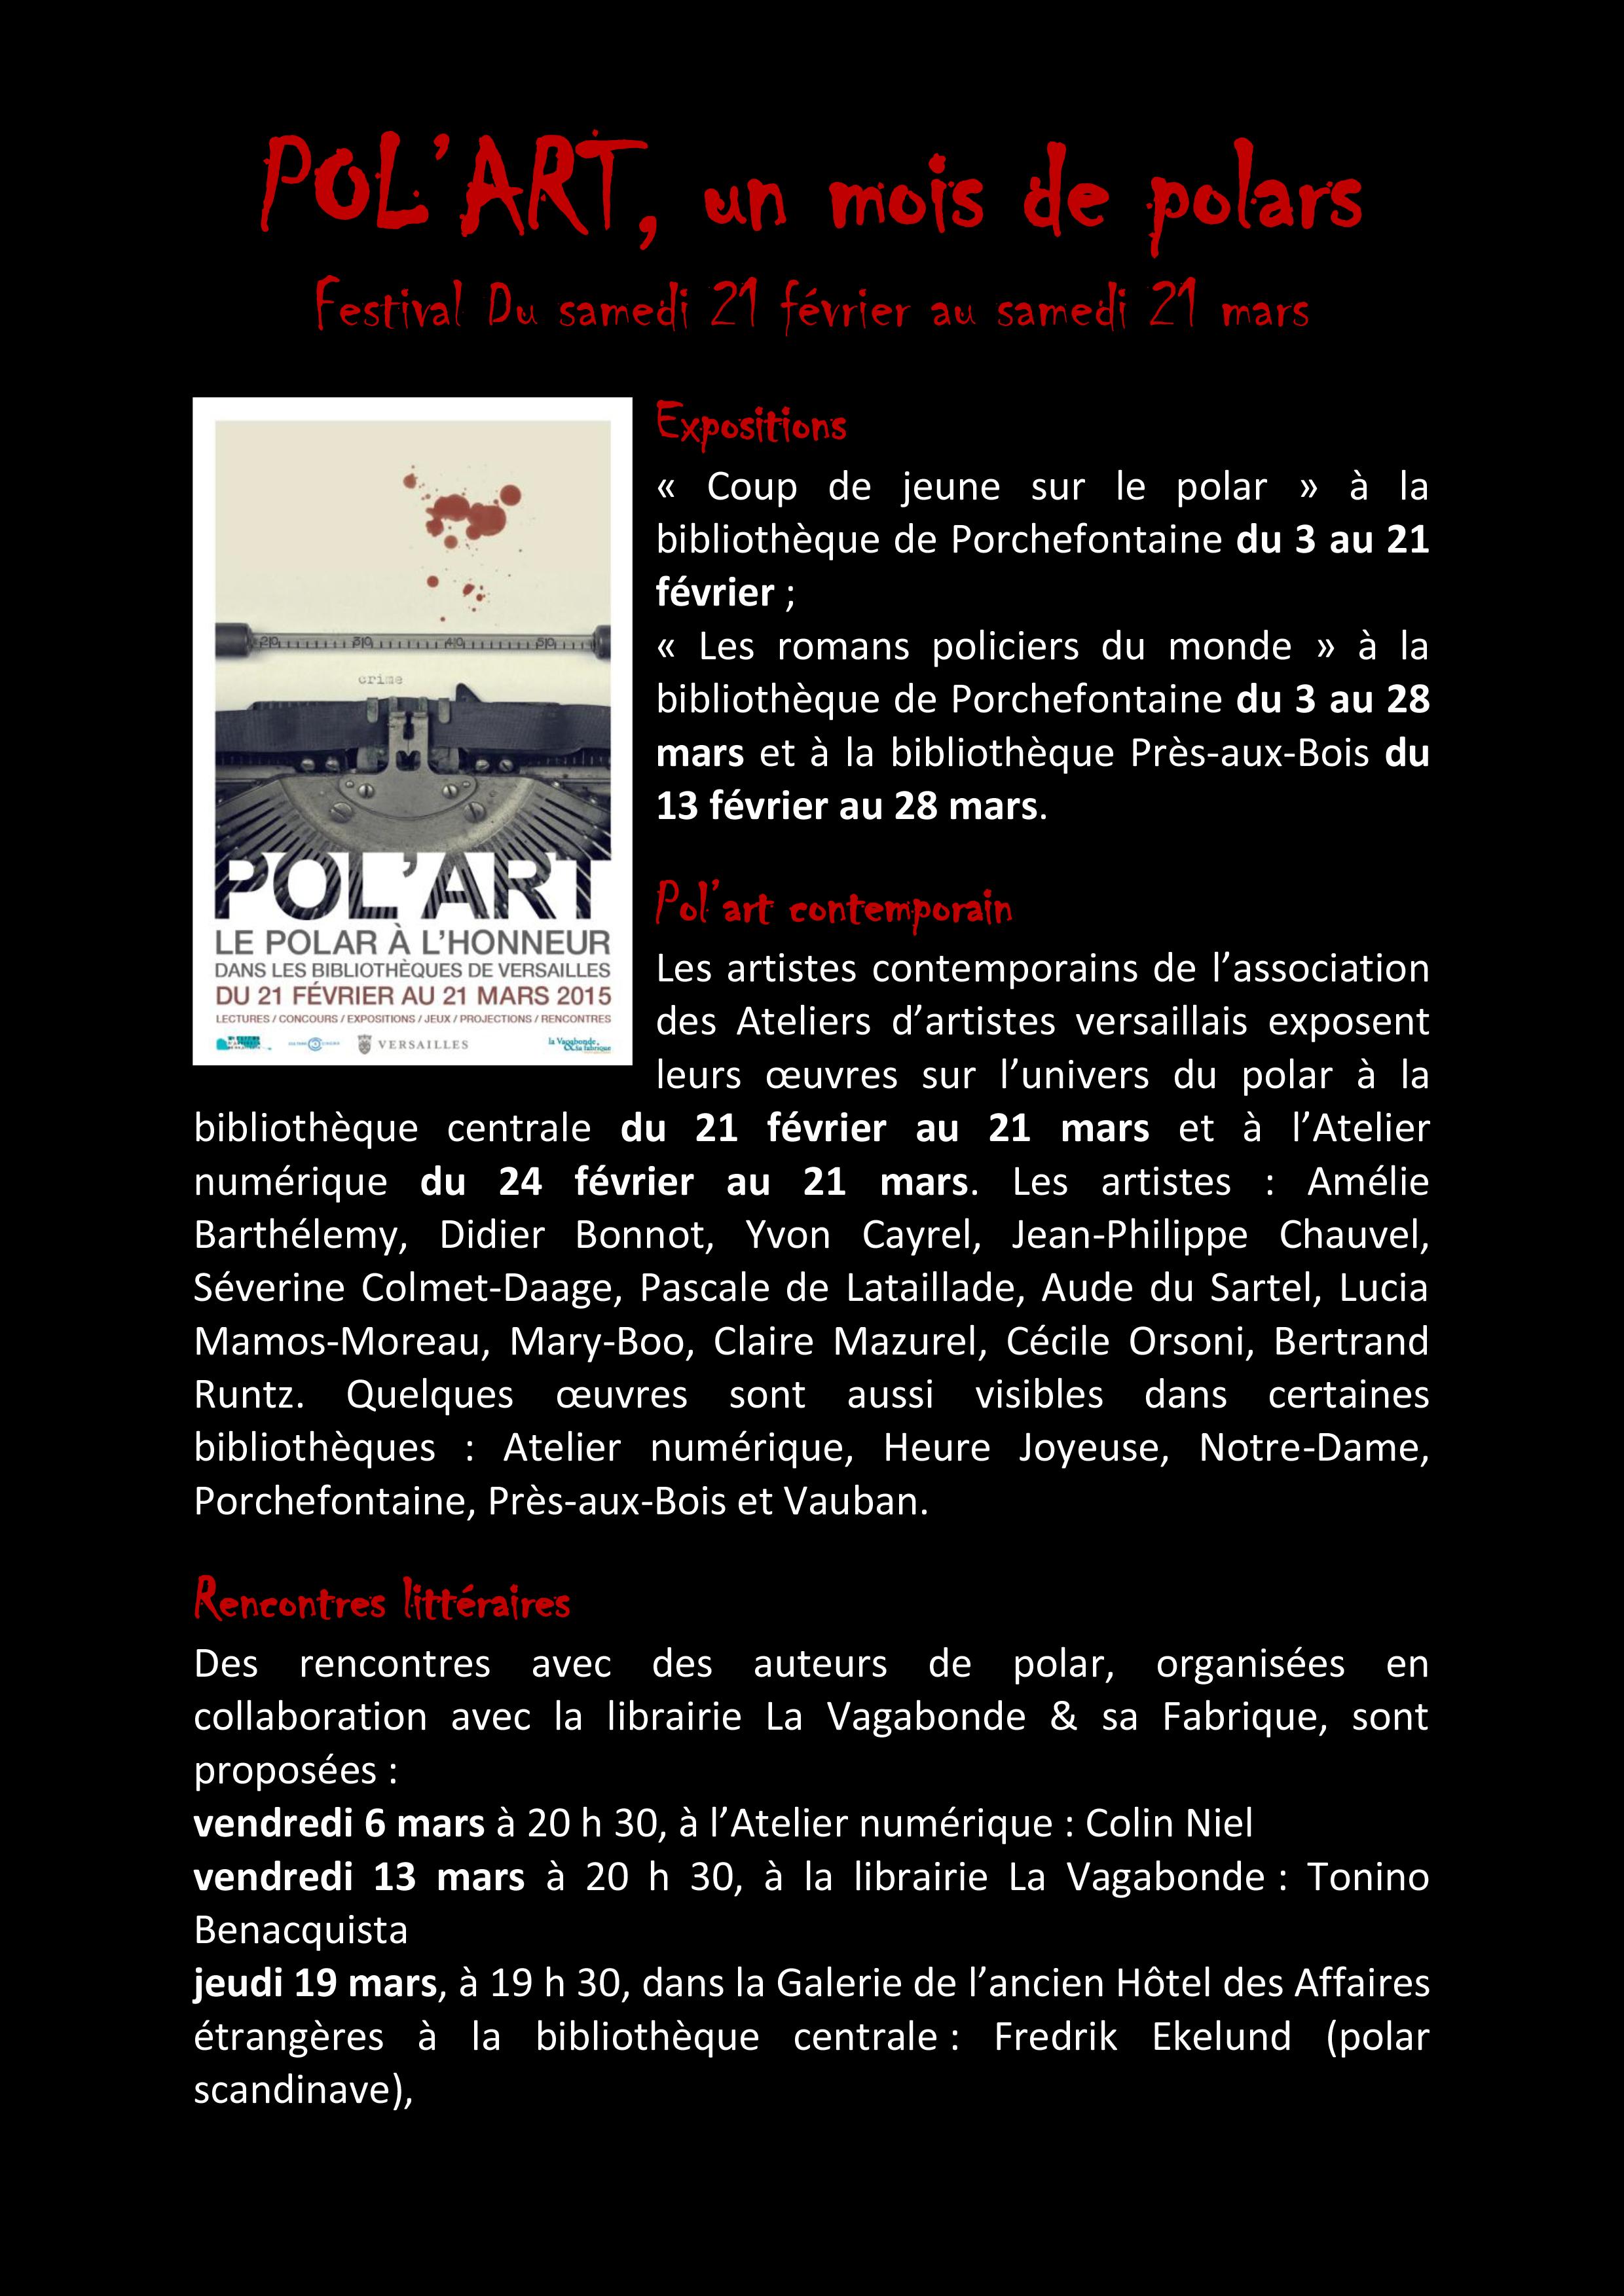 flyer MoisPolArt-1-1